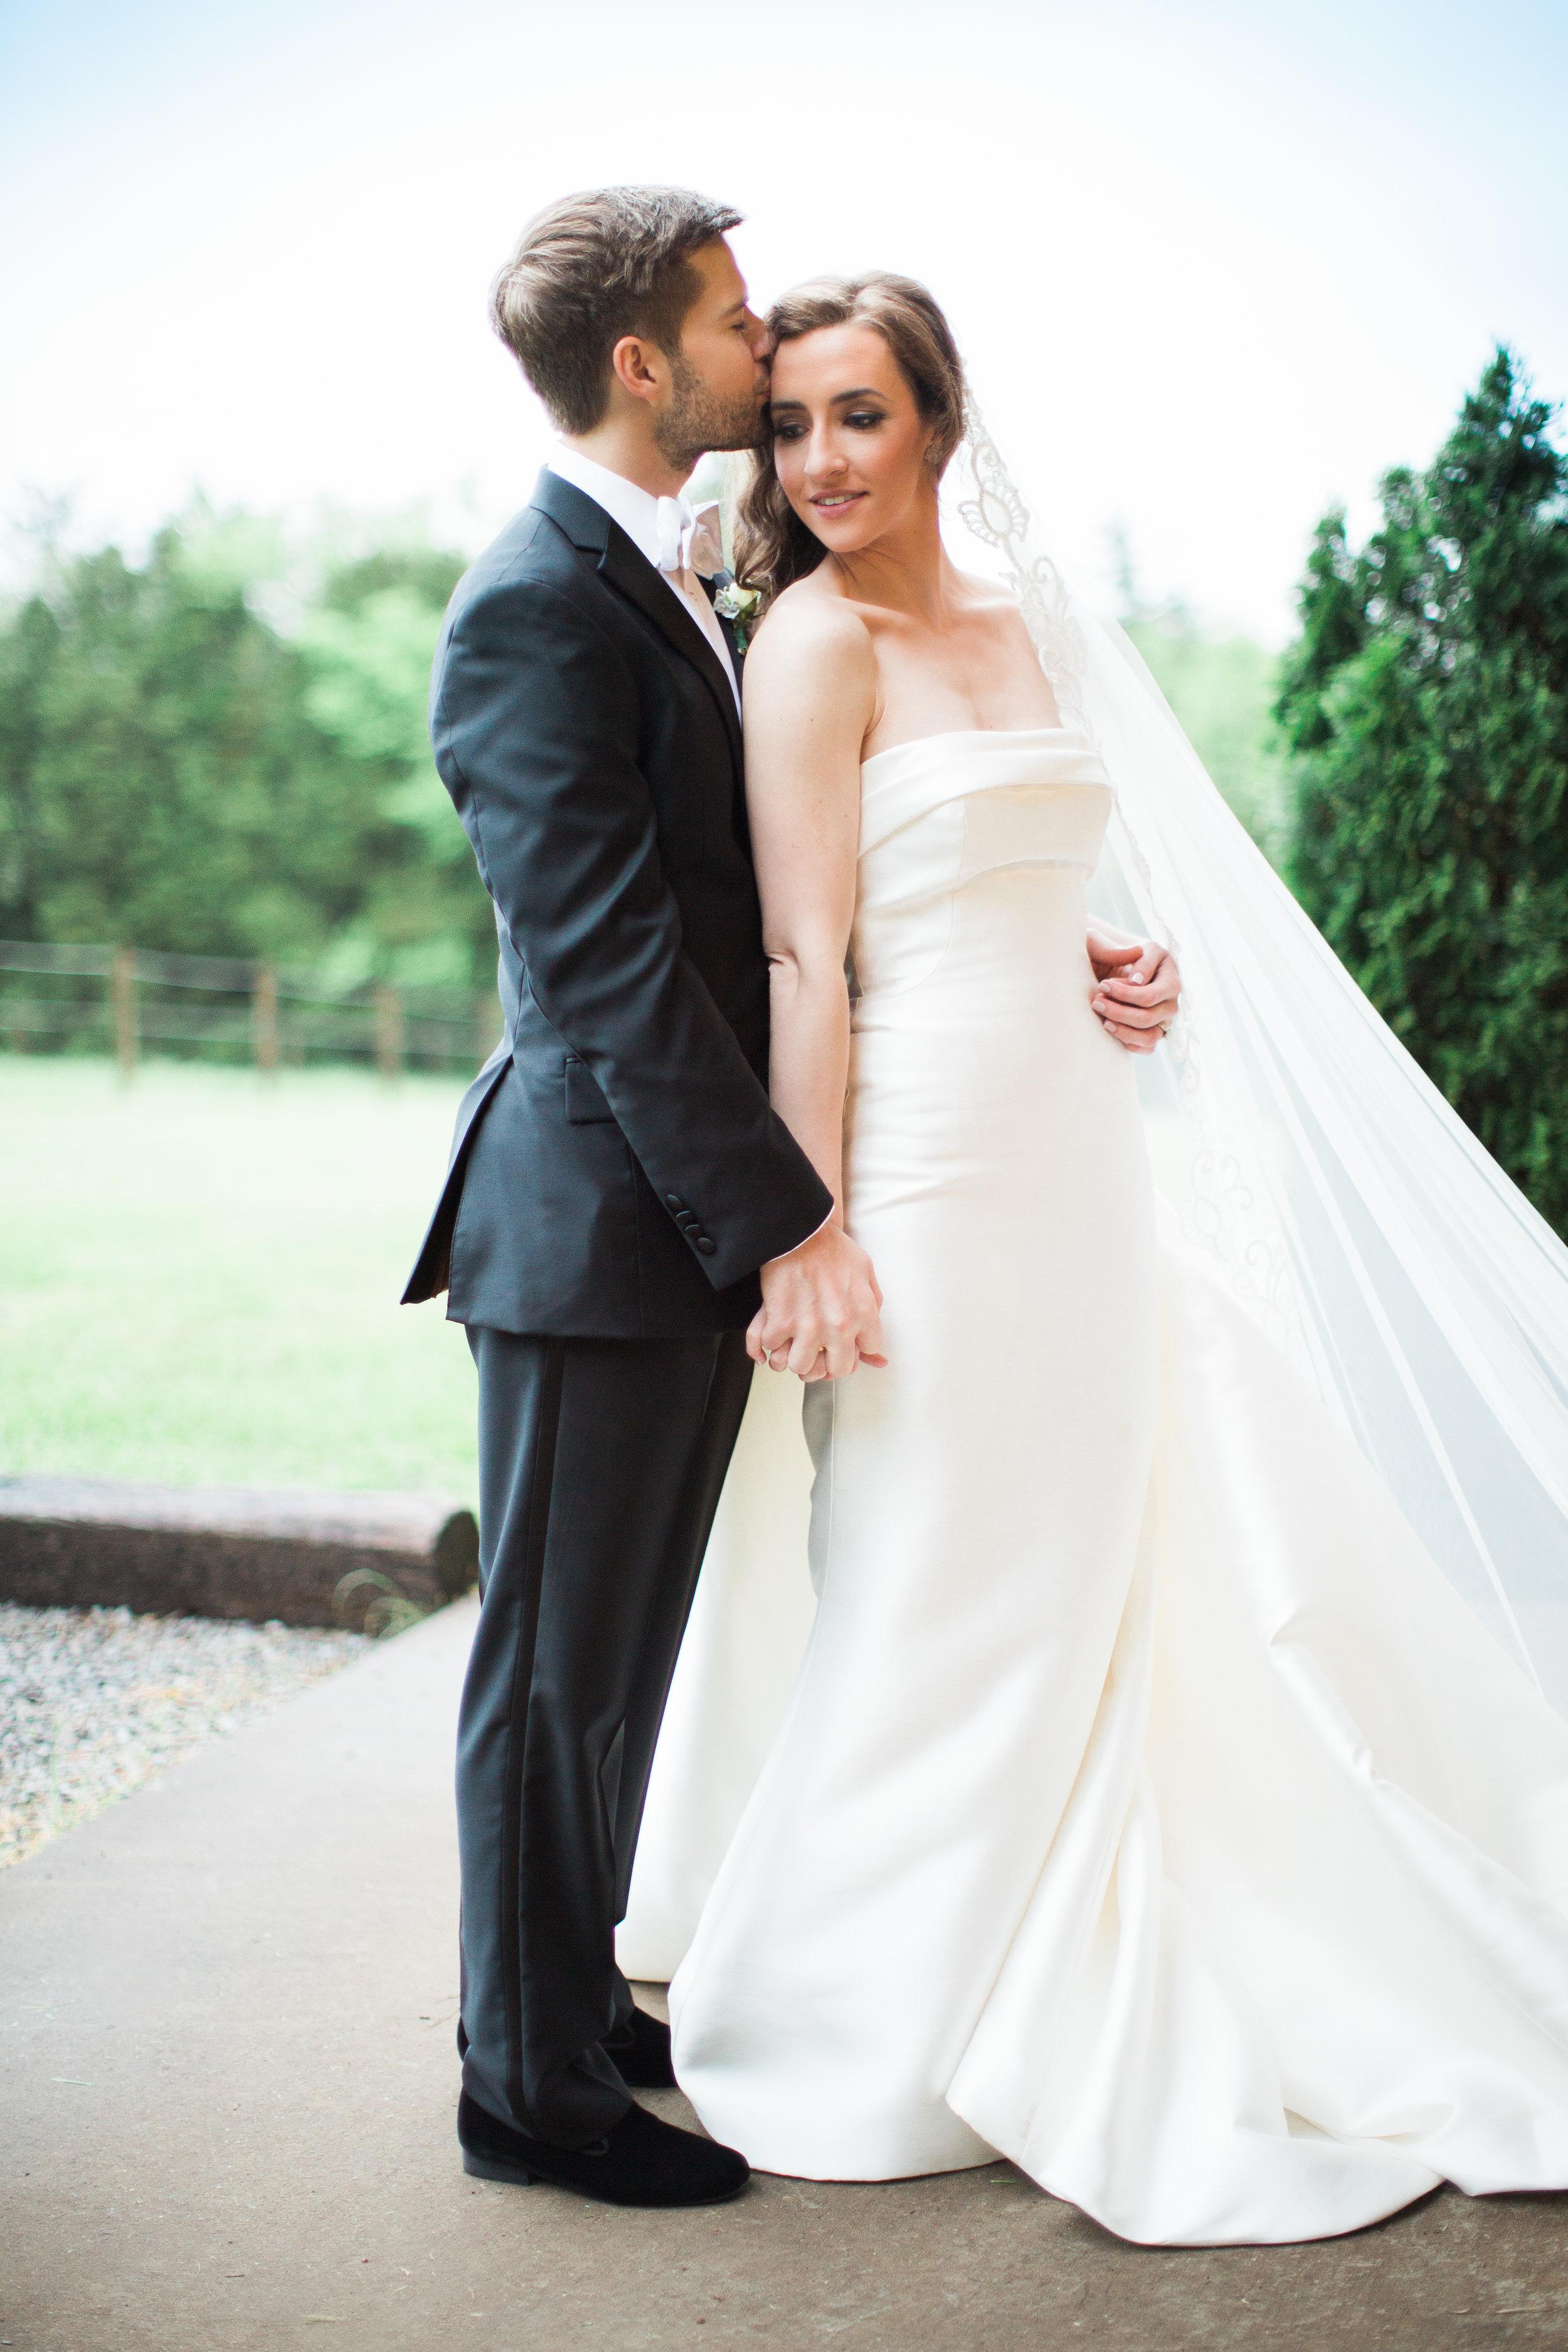 WeddingtonWedding0880.jpg